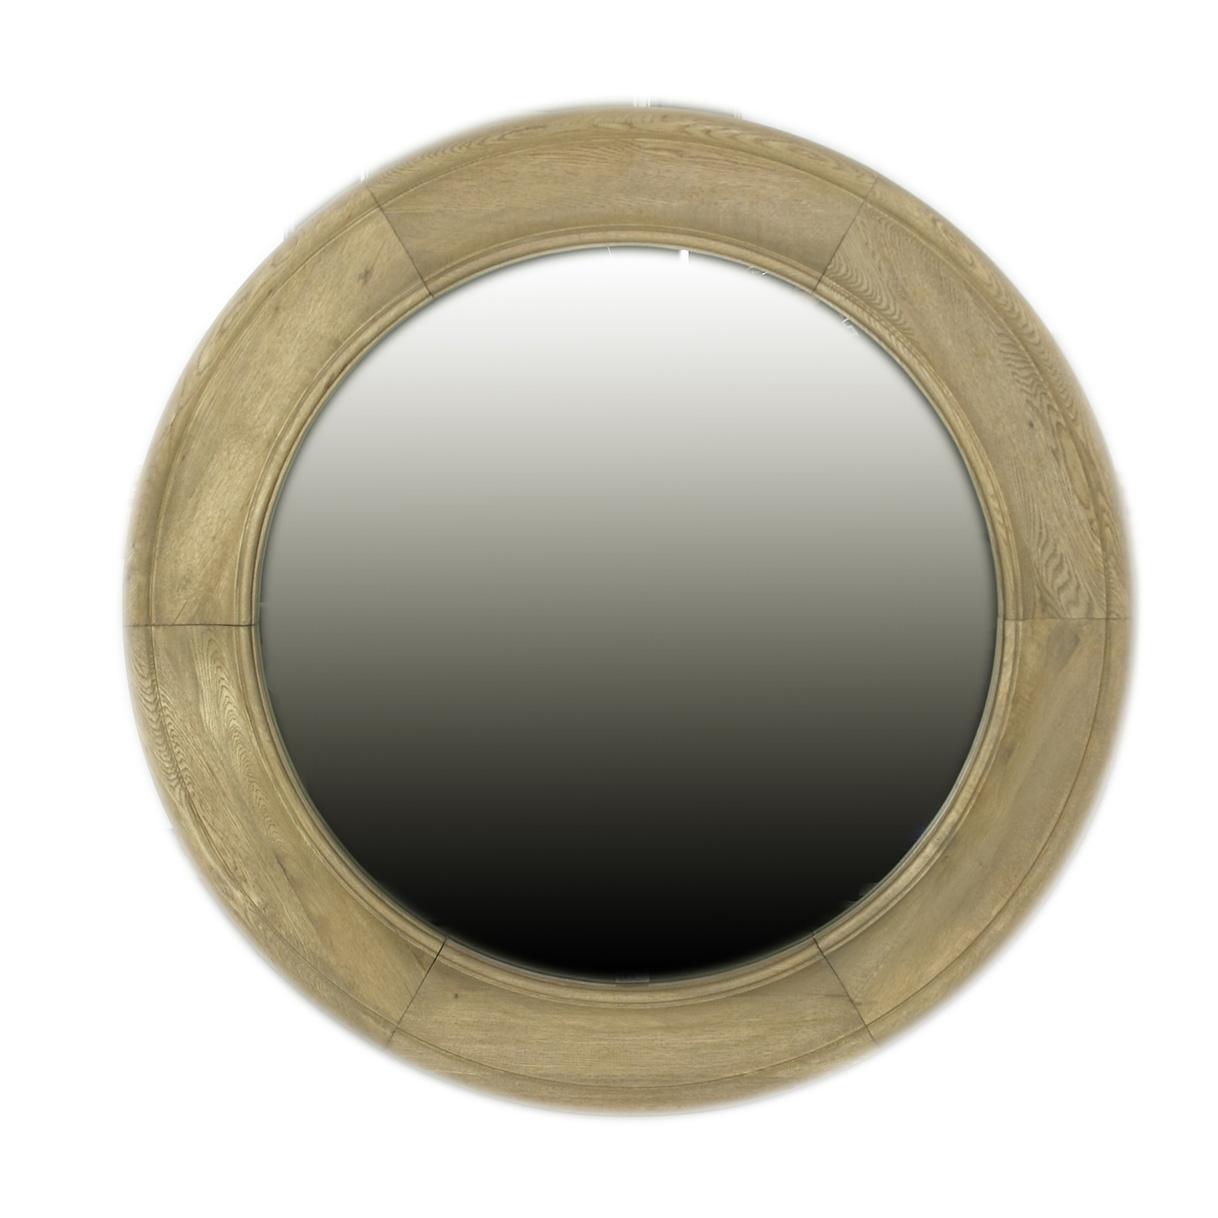 charme de provence spiegel estelle in eiche verwittert von flamant. Black Bedroom Furniture Sets. Home Design Ideas